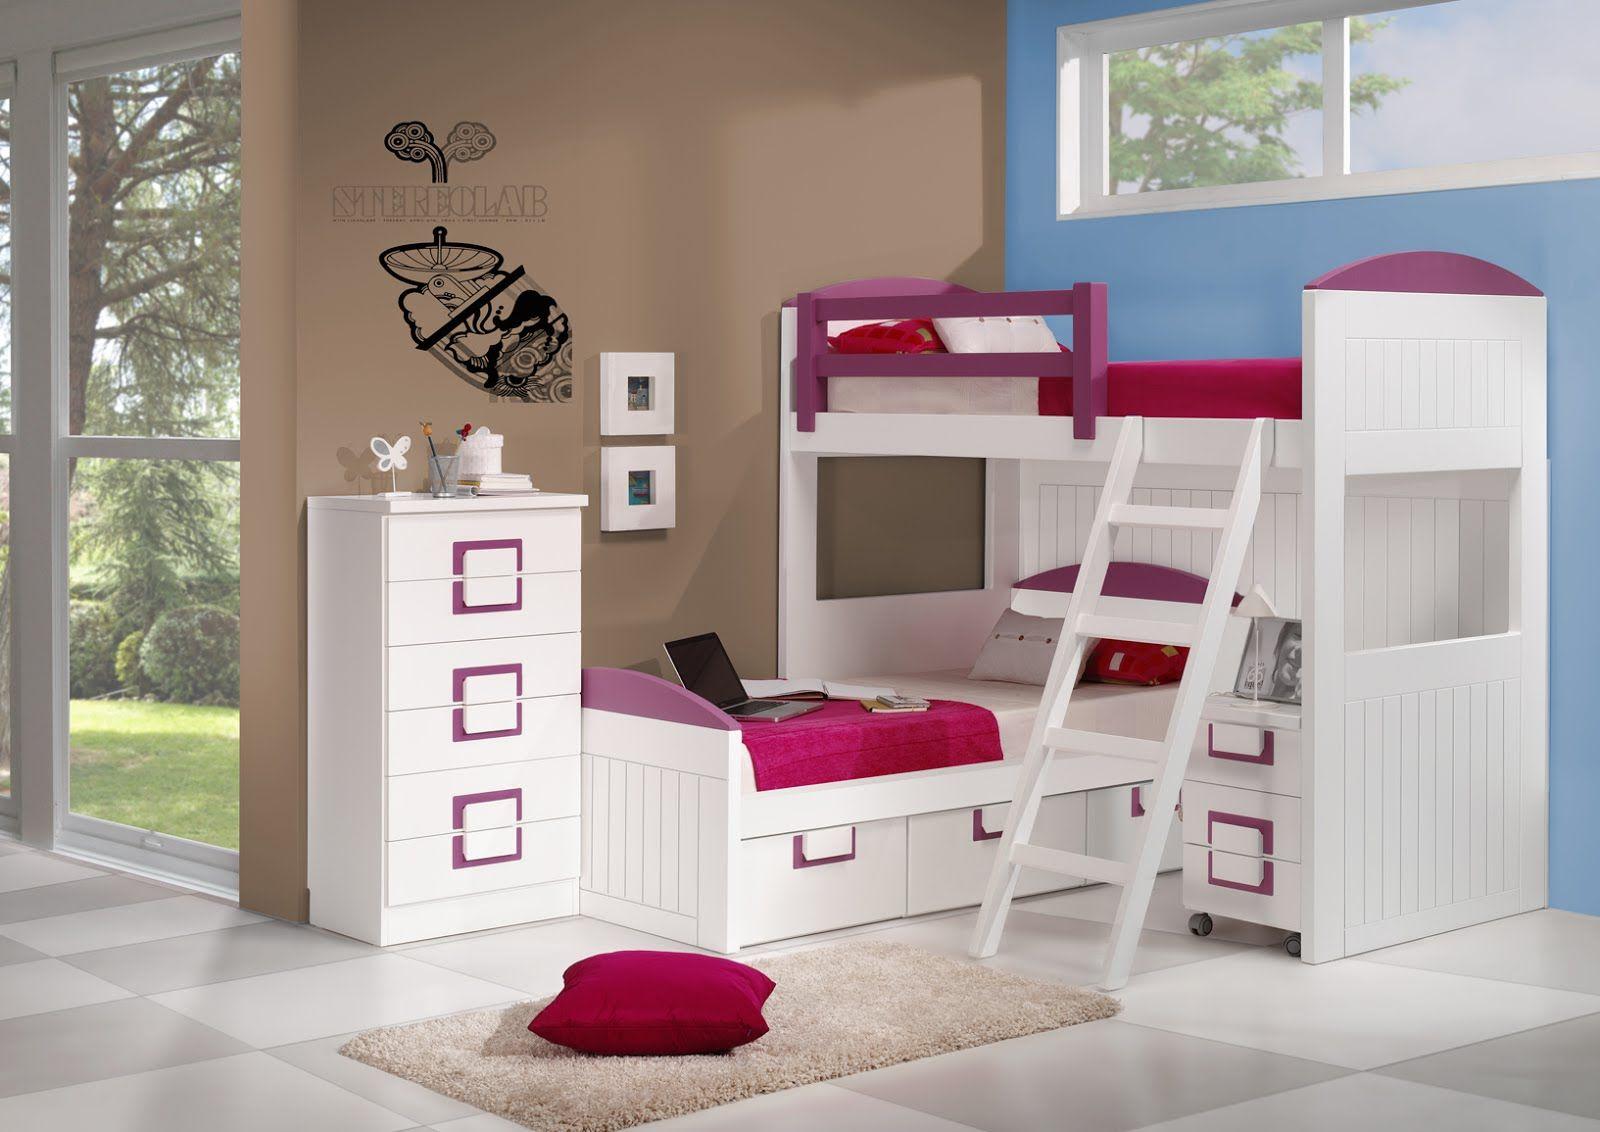 Dormitorios Juveniles Habitaciones Infantiles Y Mueble Juvenil  # Giessegi Muebles Infantil